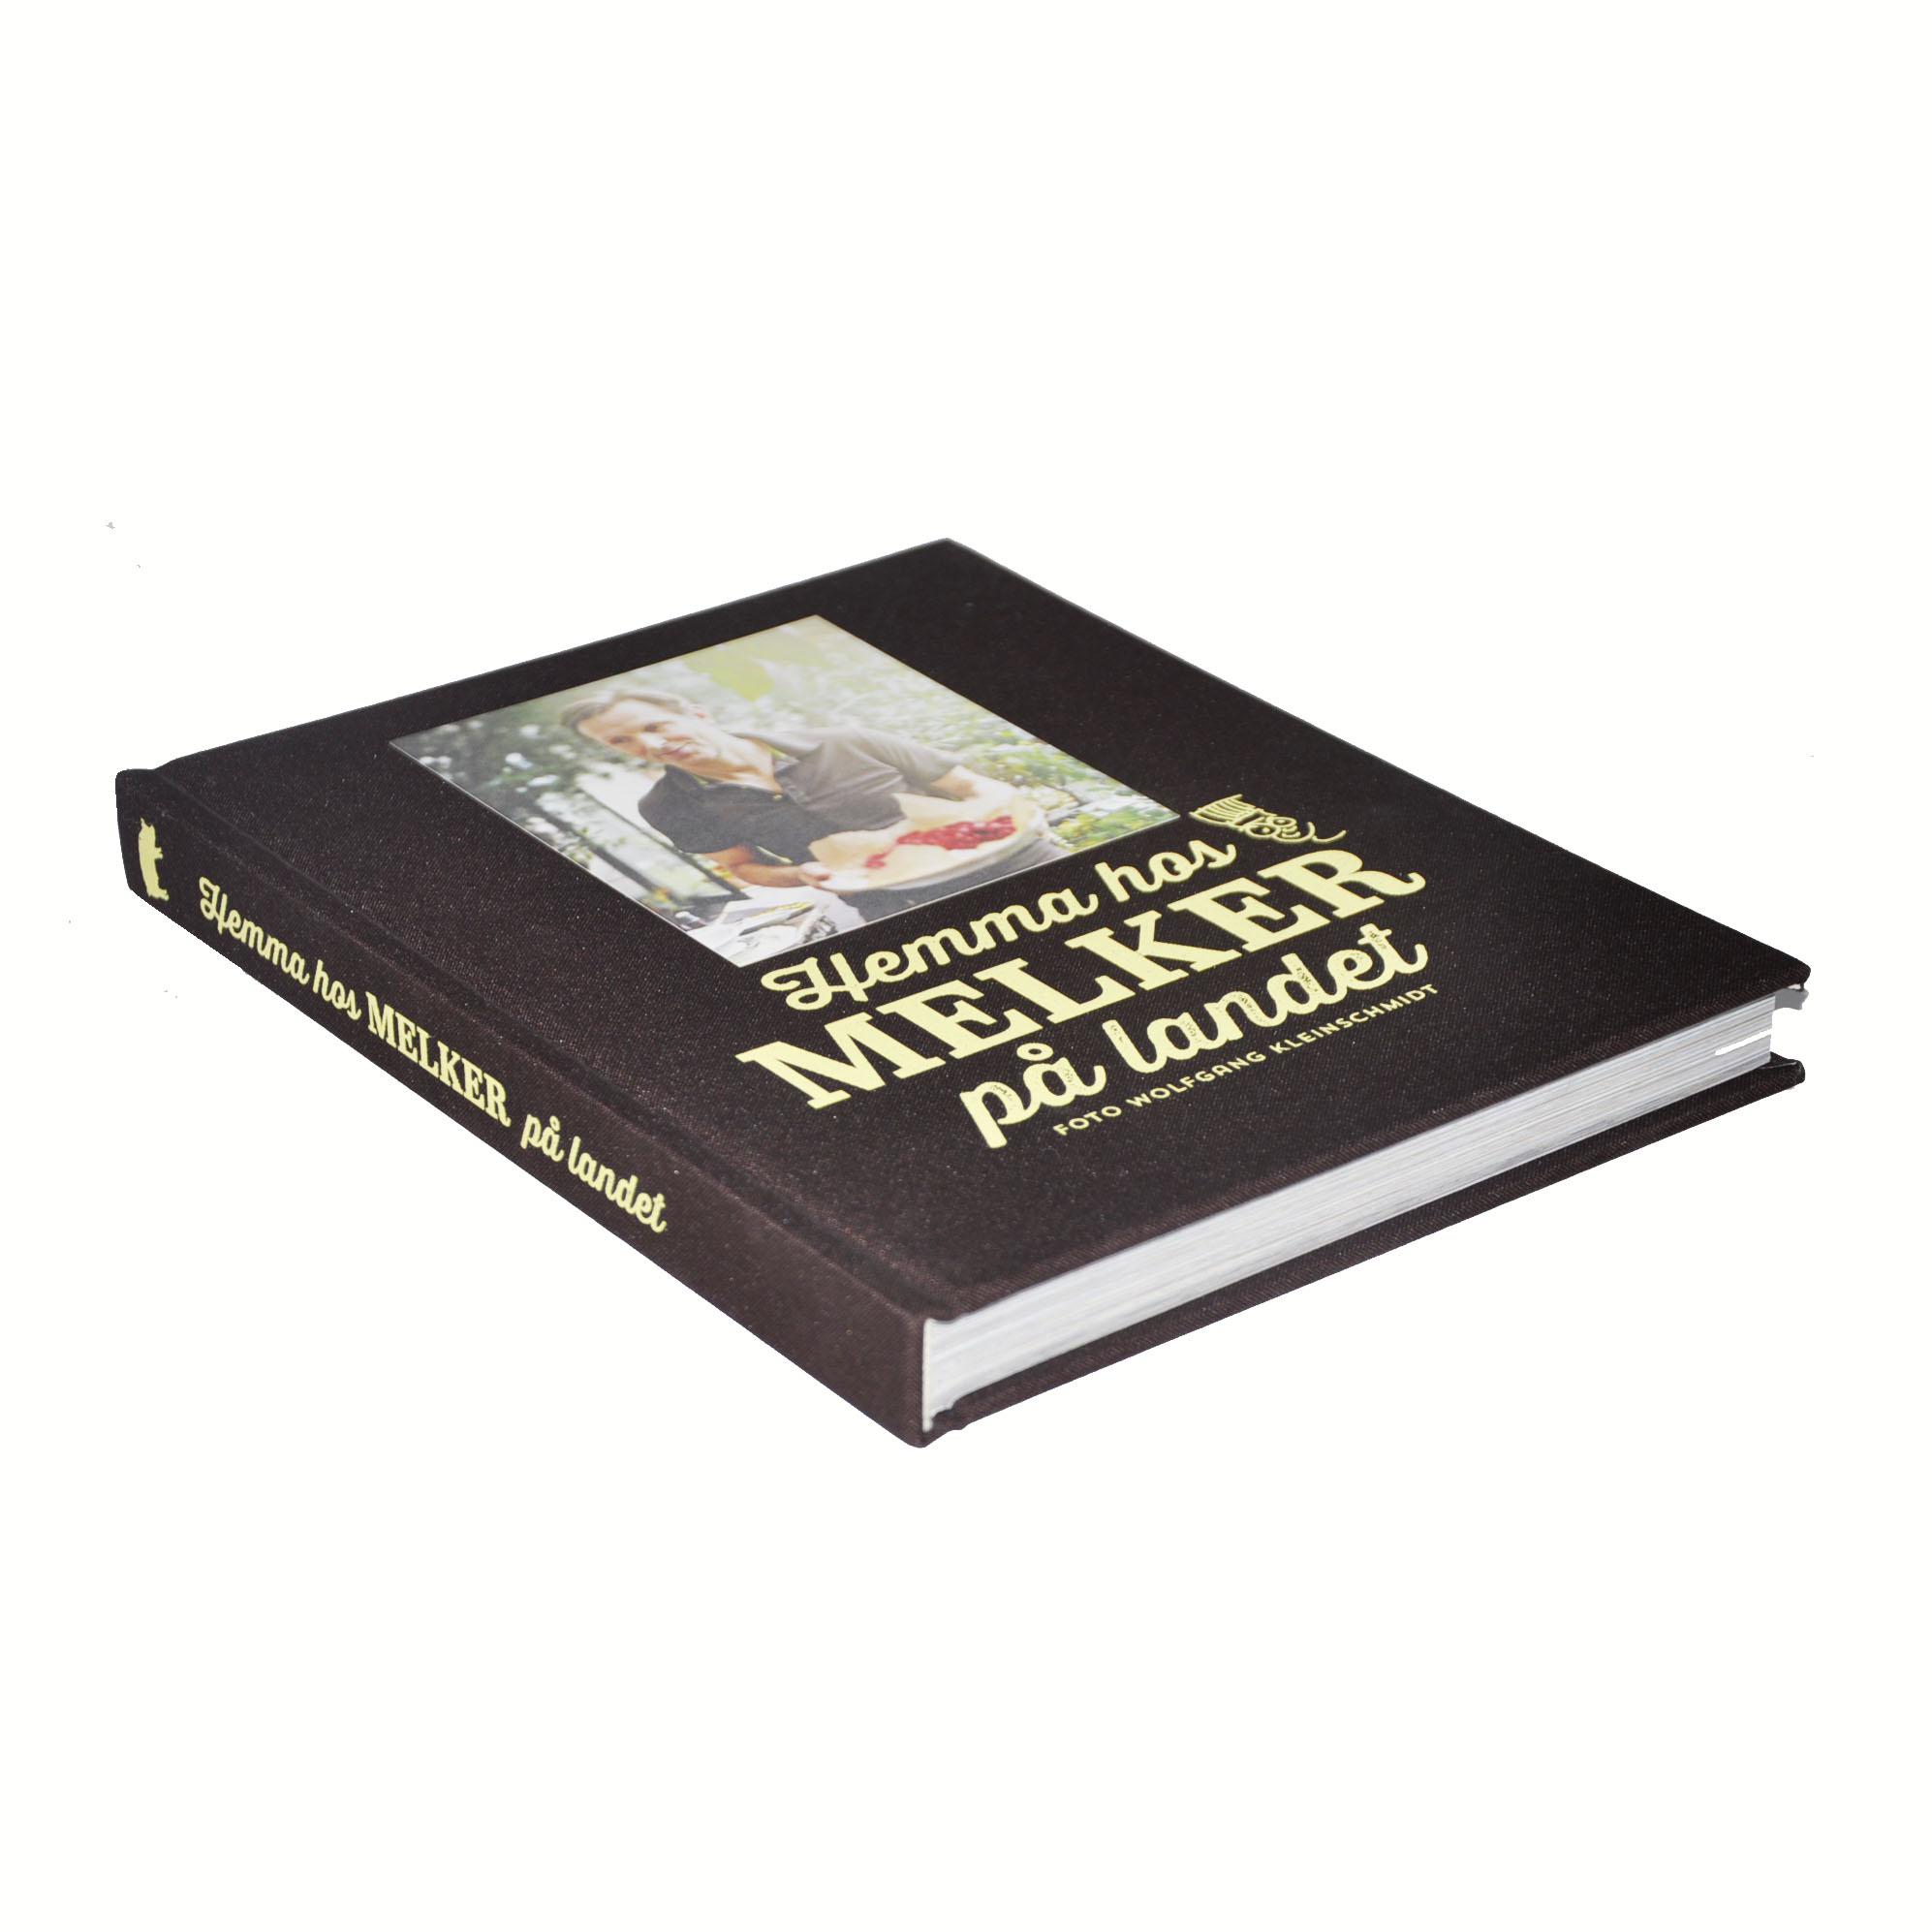 OEM hardcover printing